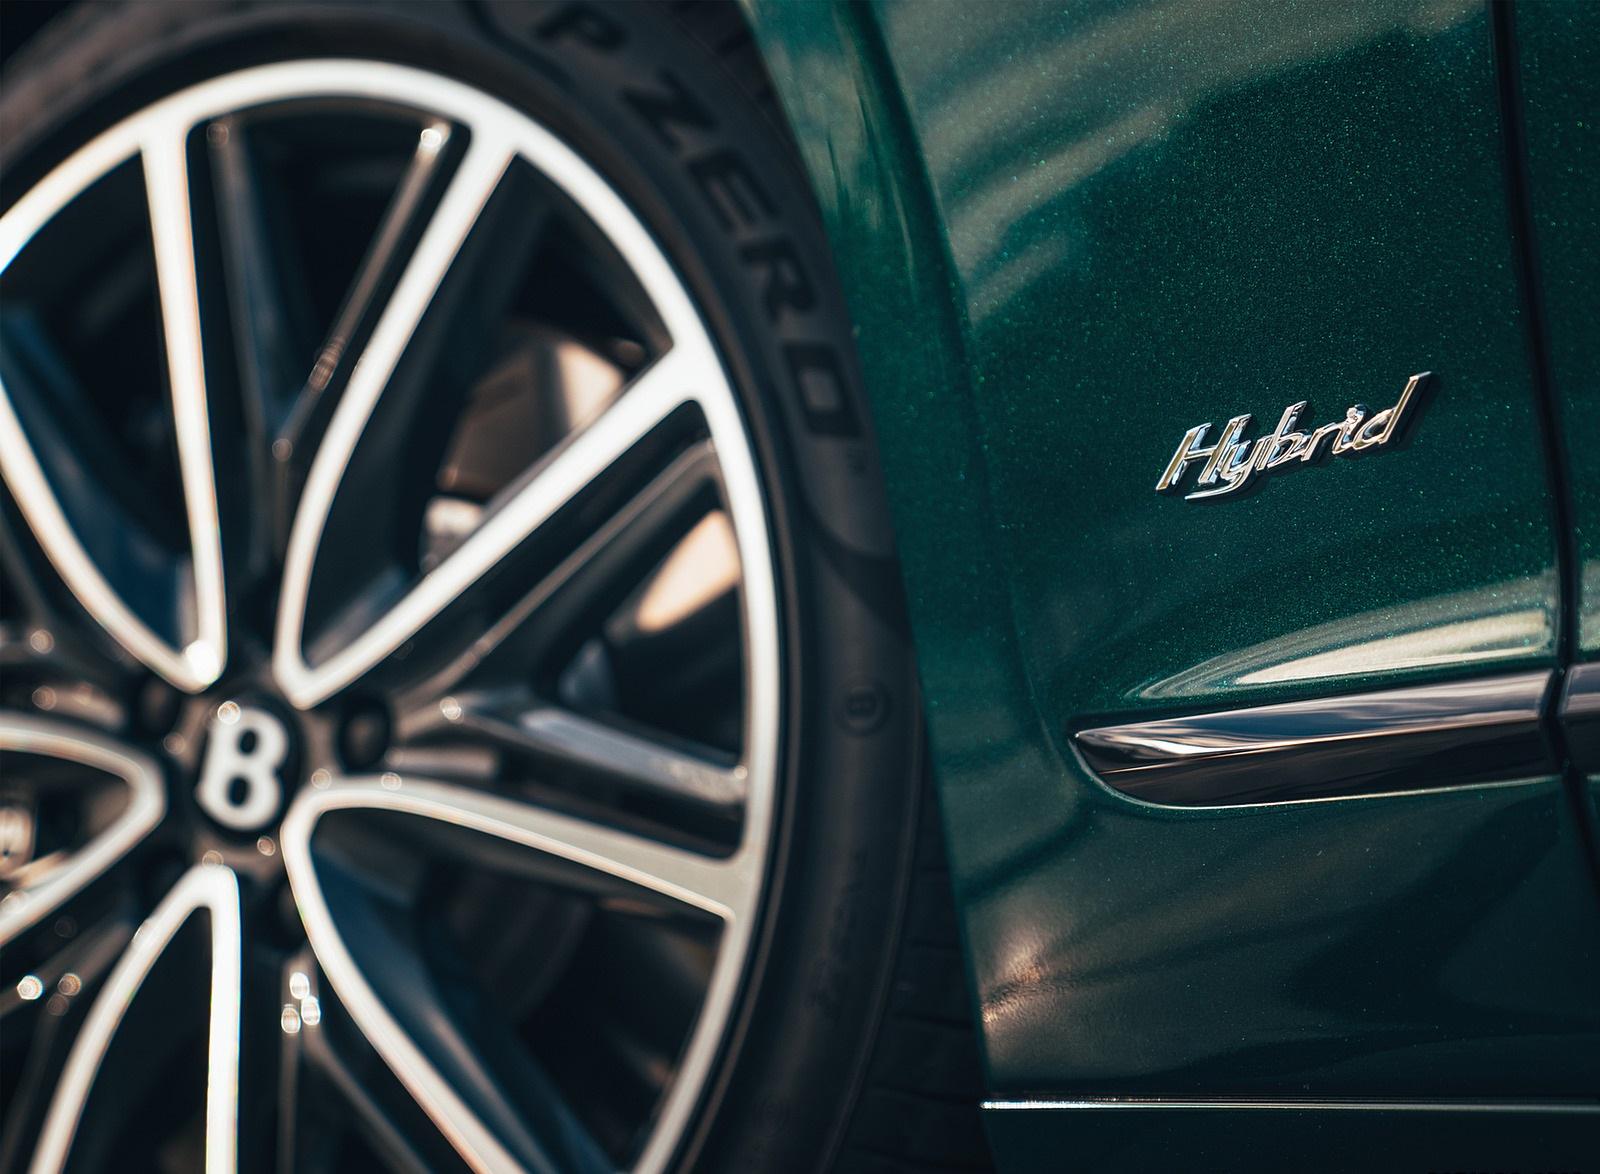 2022 Bentley Flying Spur Hybrid Detail Wallpapers (7)